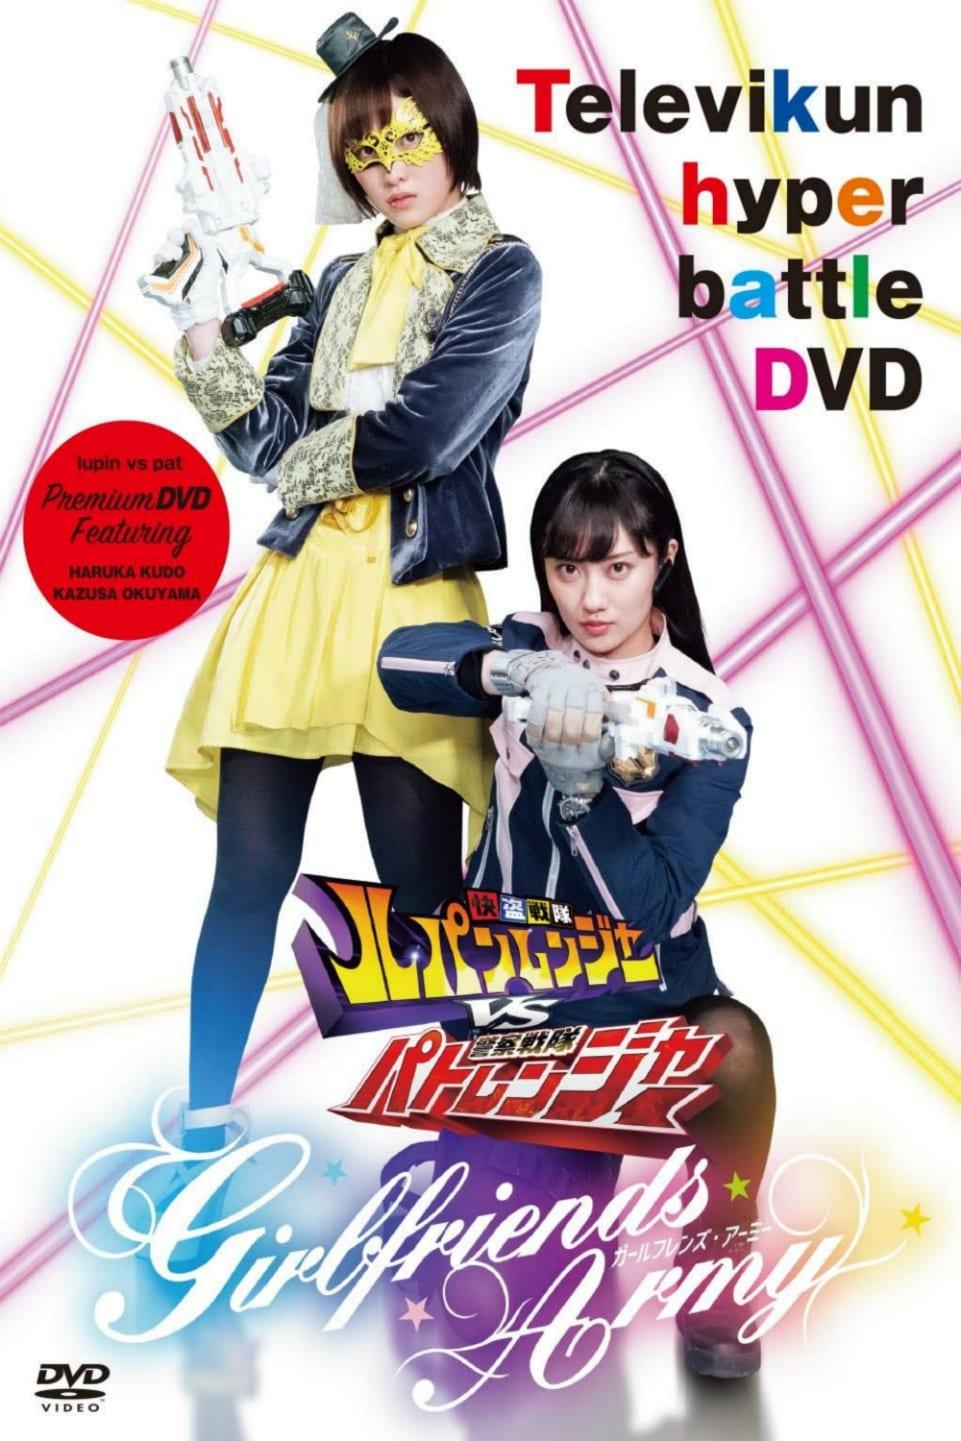 Kaitou Sentai Lupinranger VS Keisatsu Sentai Patranger ~GIRLFRIENDS ARMY~ (2018)